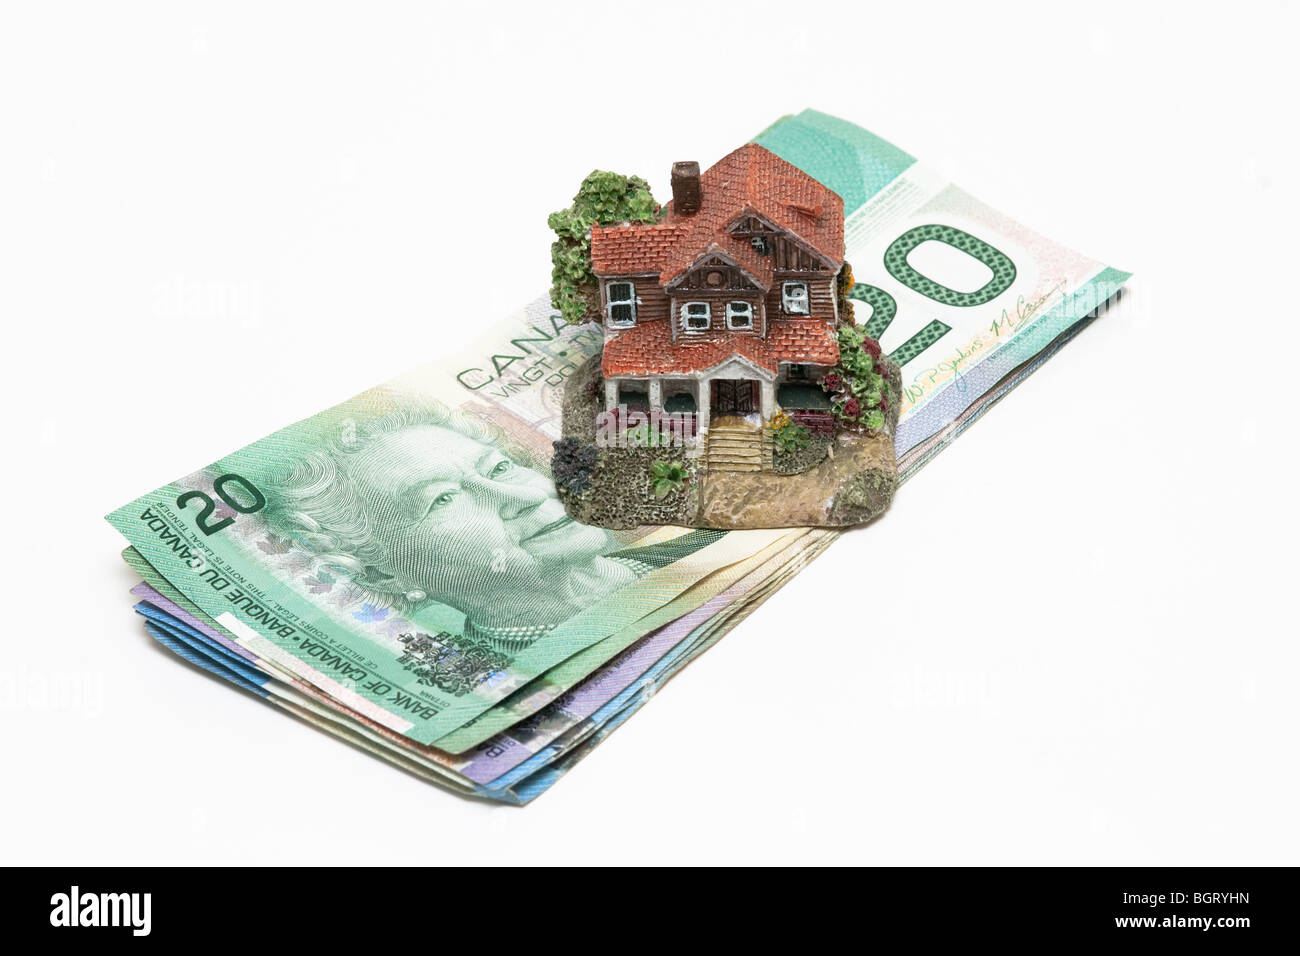 canada,canadian,housing,mortgage,market,debt - Stock Image